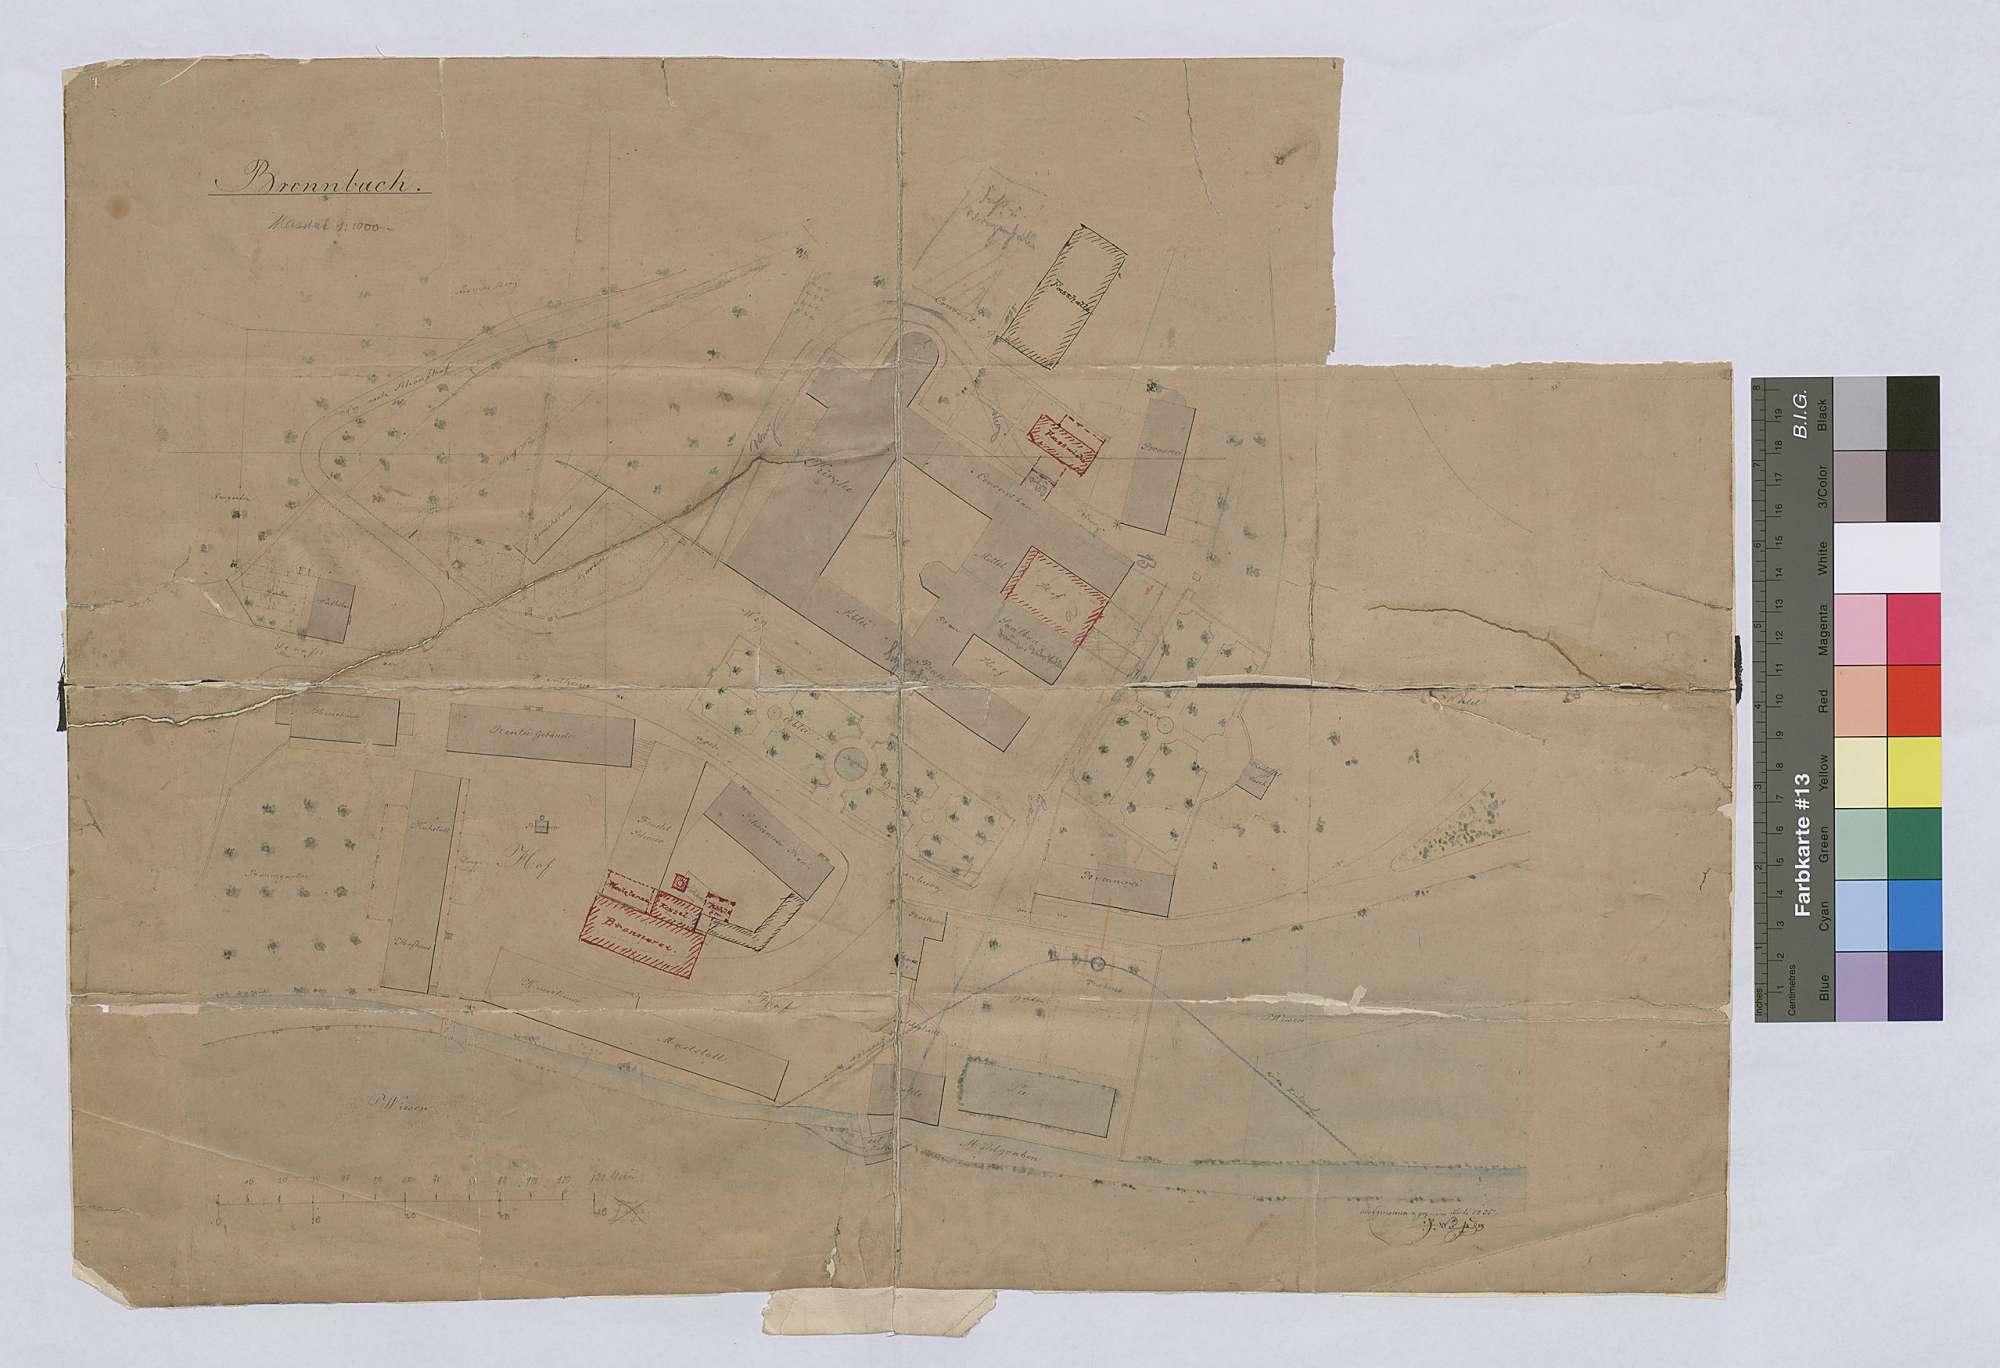 Lageplan Bronnbach, Bild 1